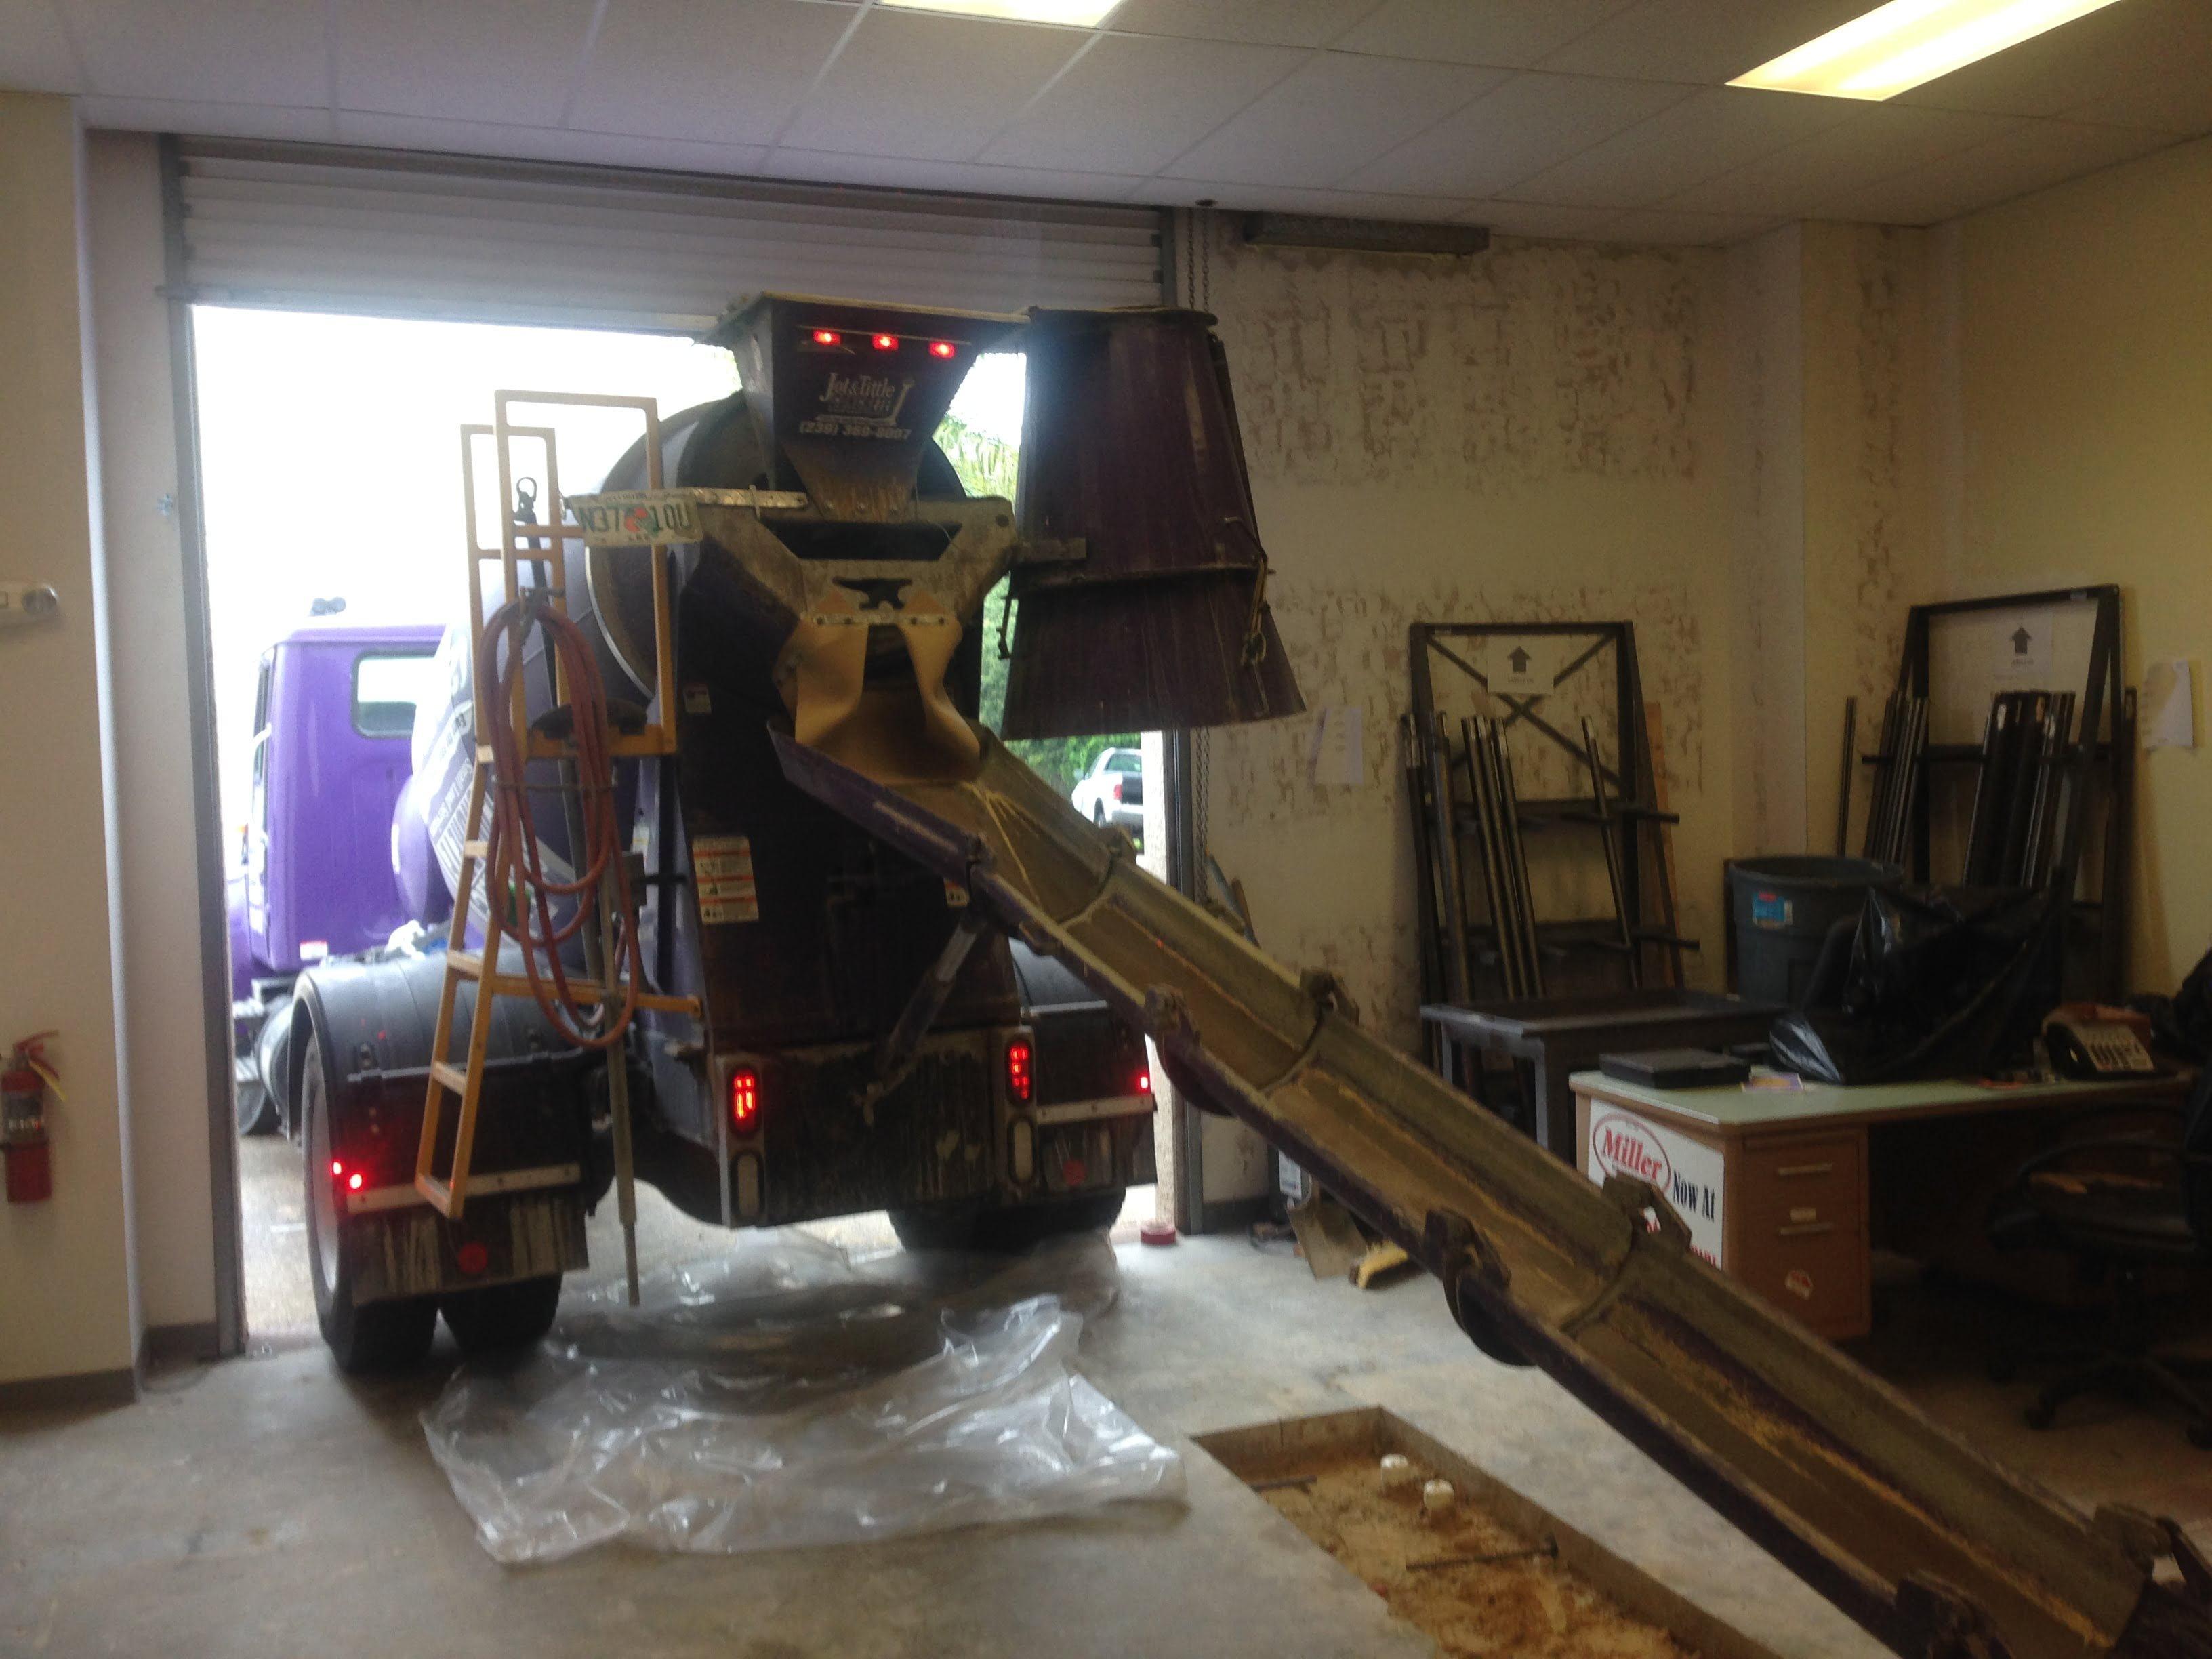 jot and tittle truck under building